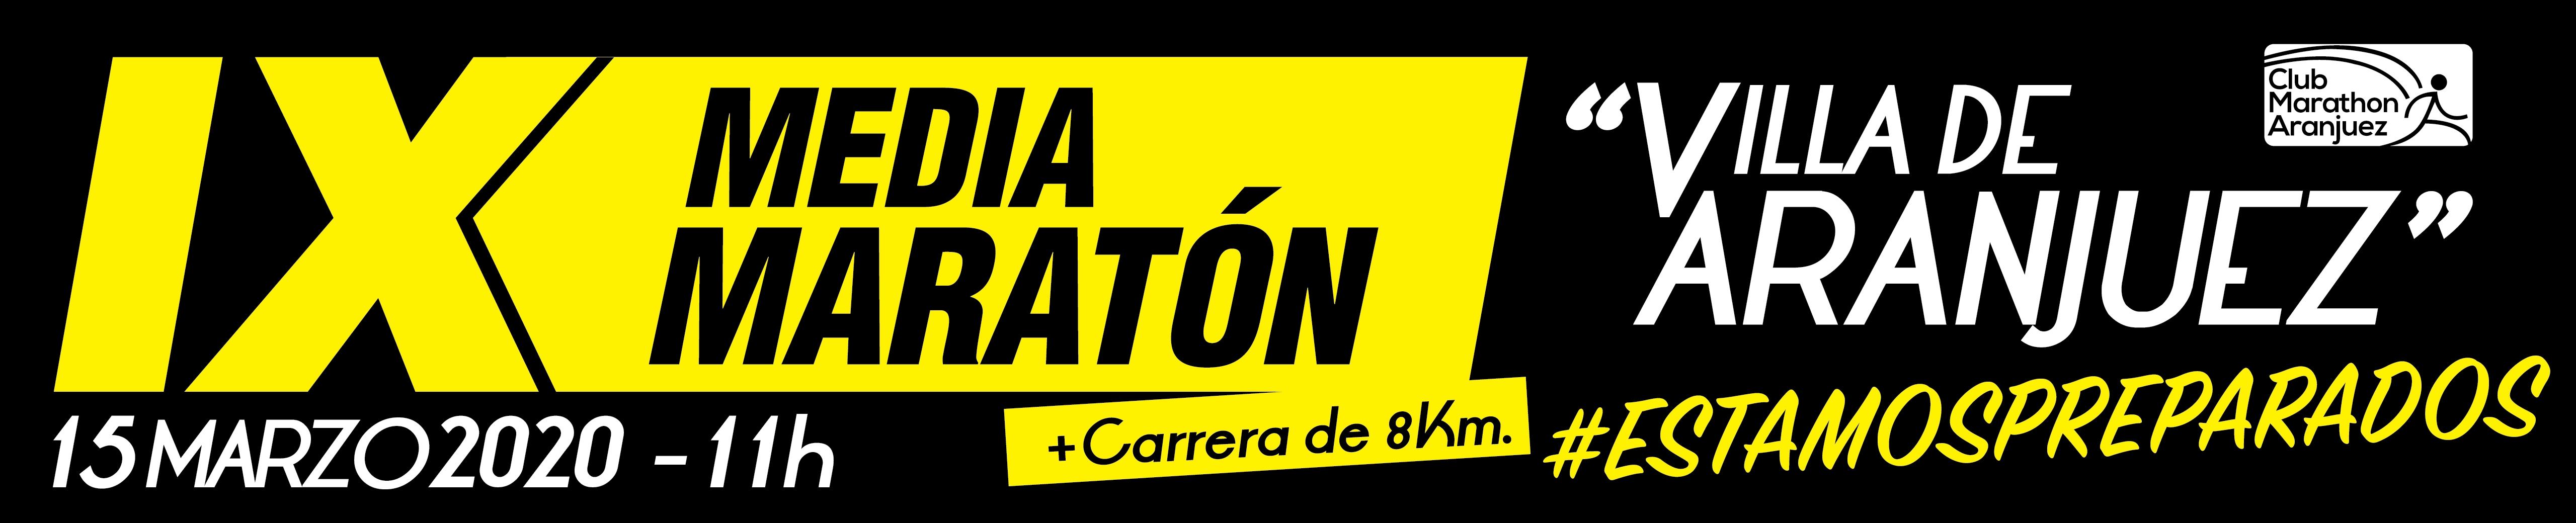 IX Media Maratón Villa de Aranjuez y 8km